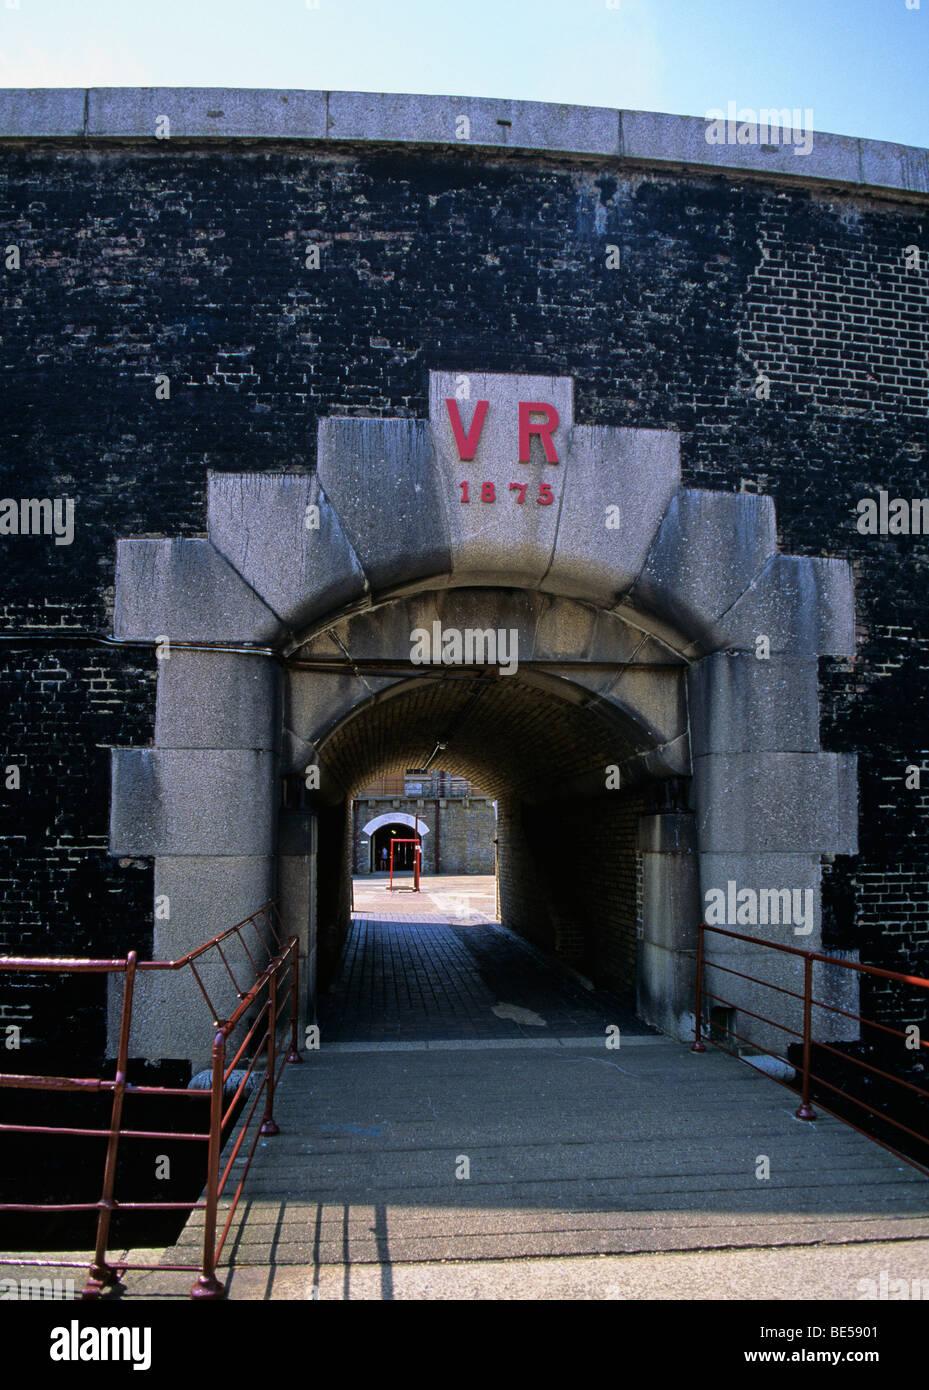 Entrance to Landguard Fort Felixstowe - Stock Image